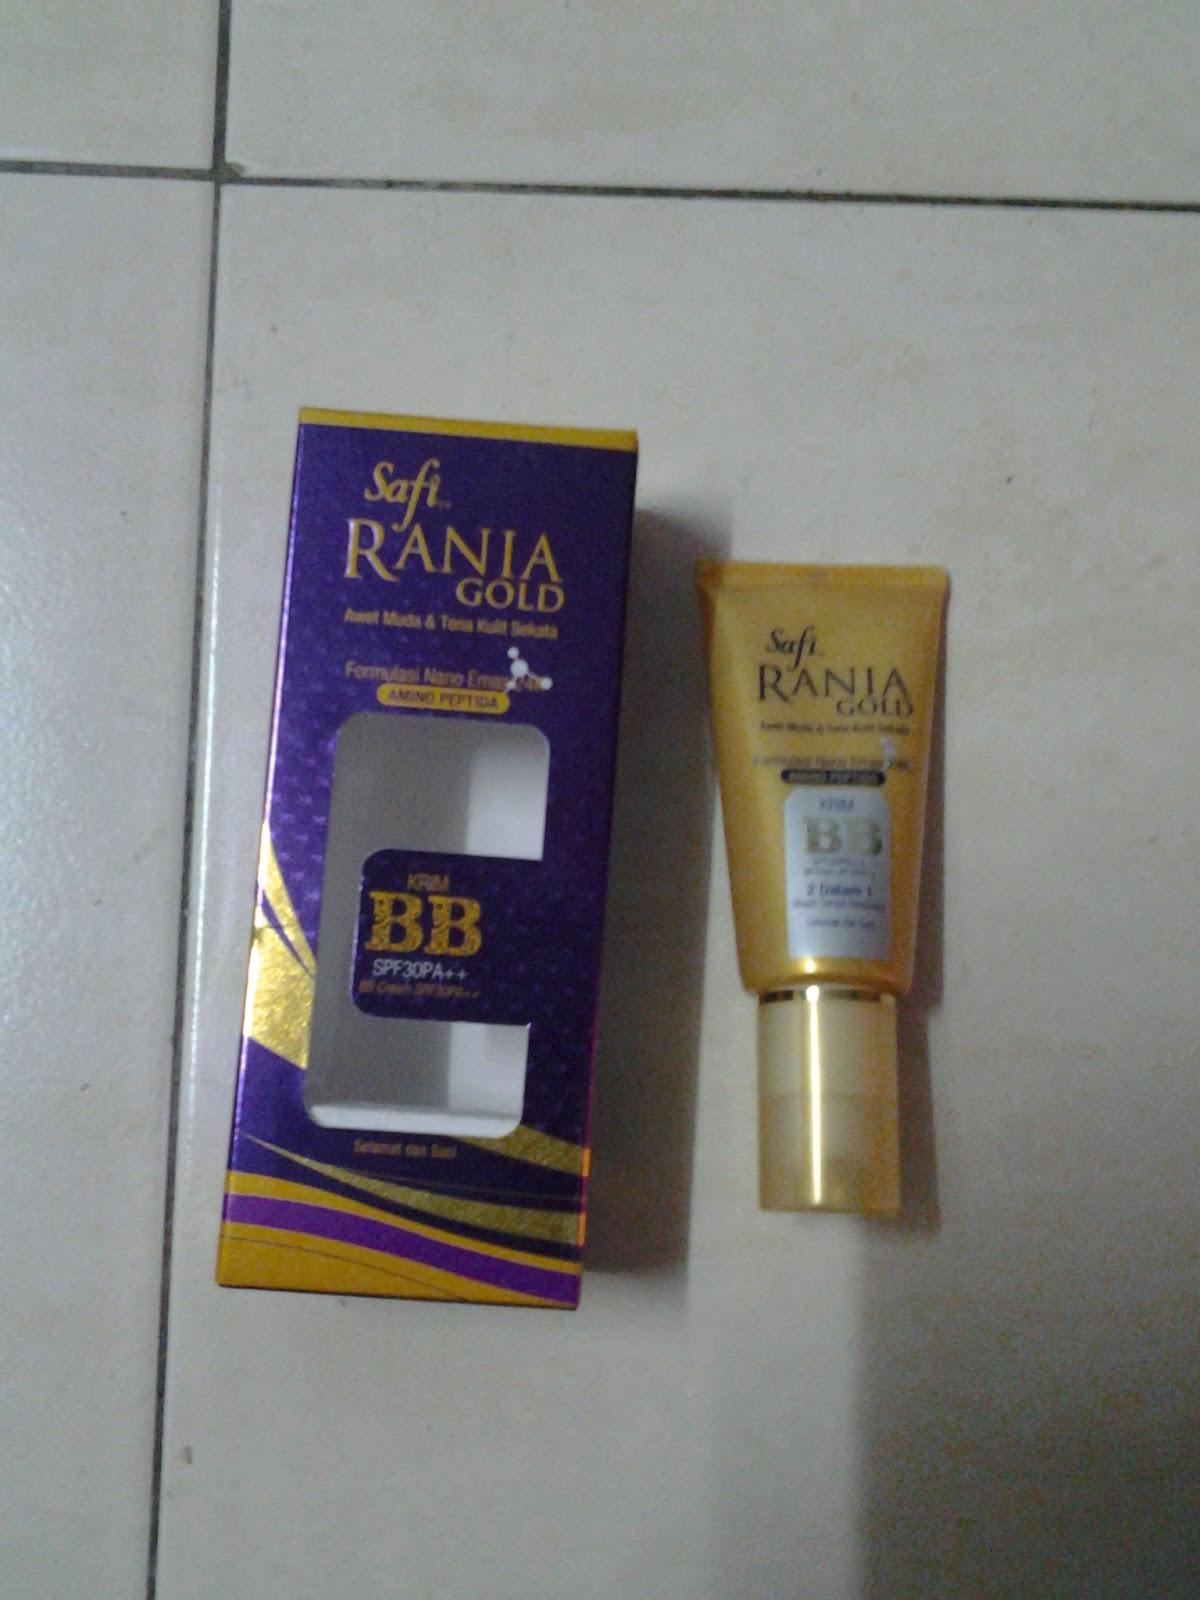 Celoteh Ibu Amirul Krim BB Safi Rania Gold